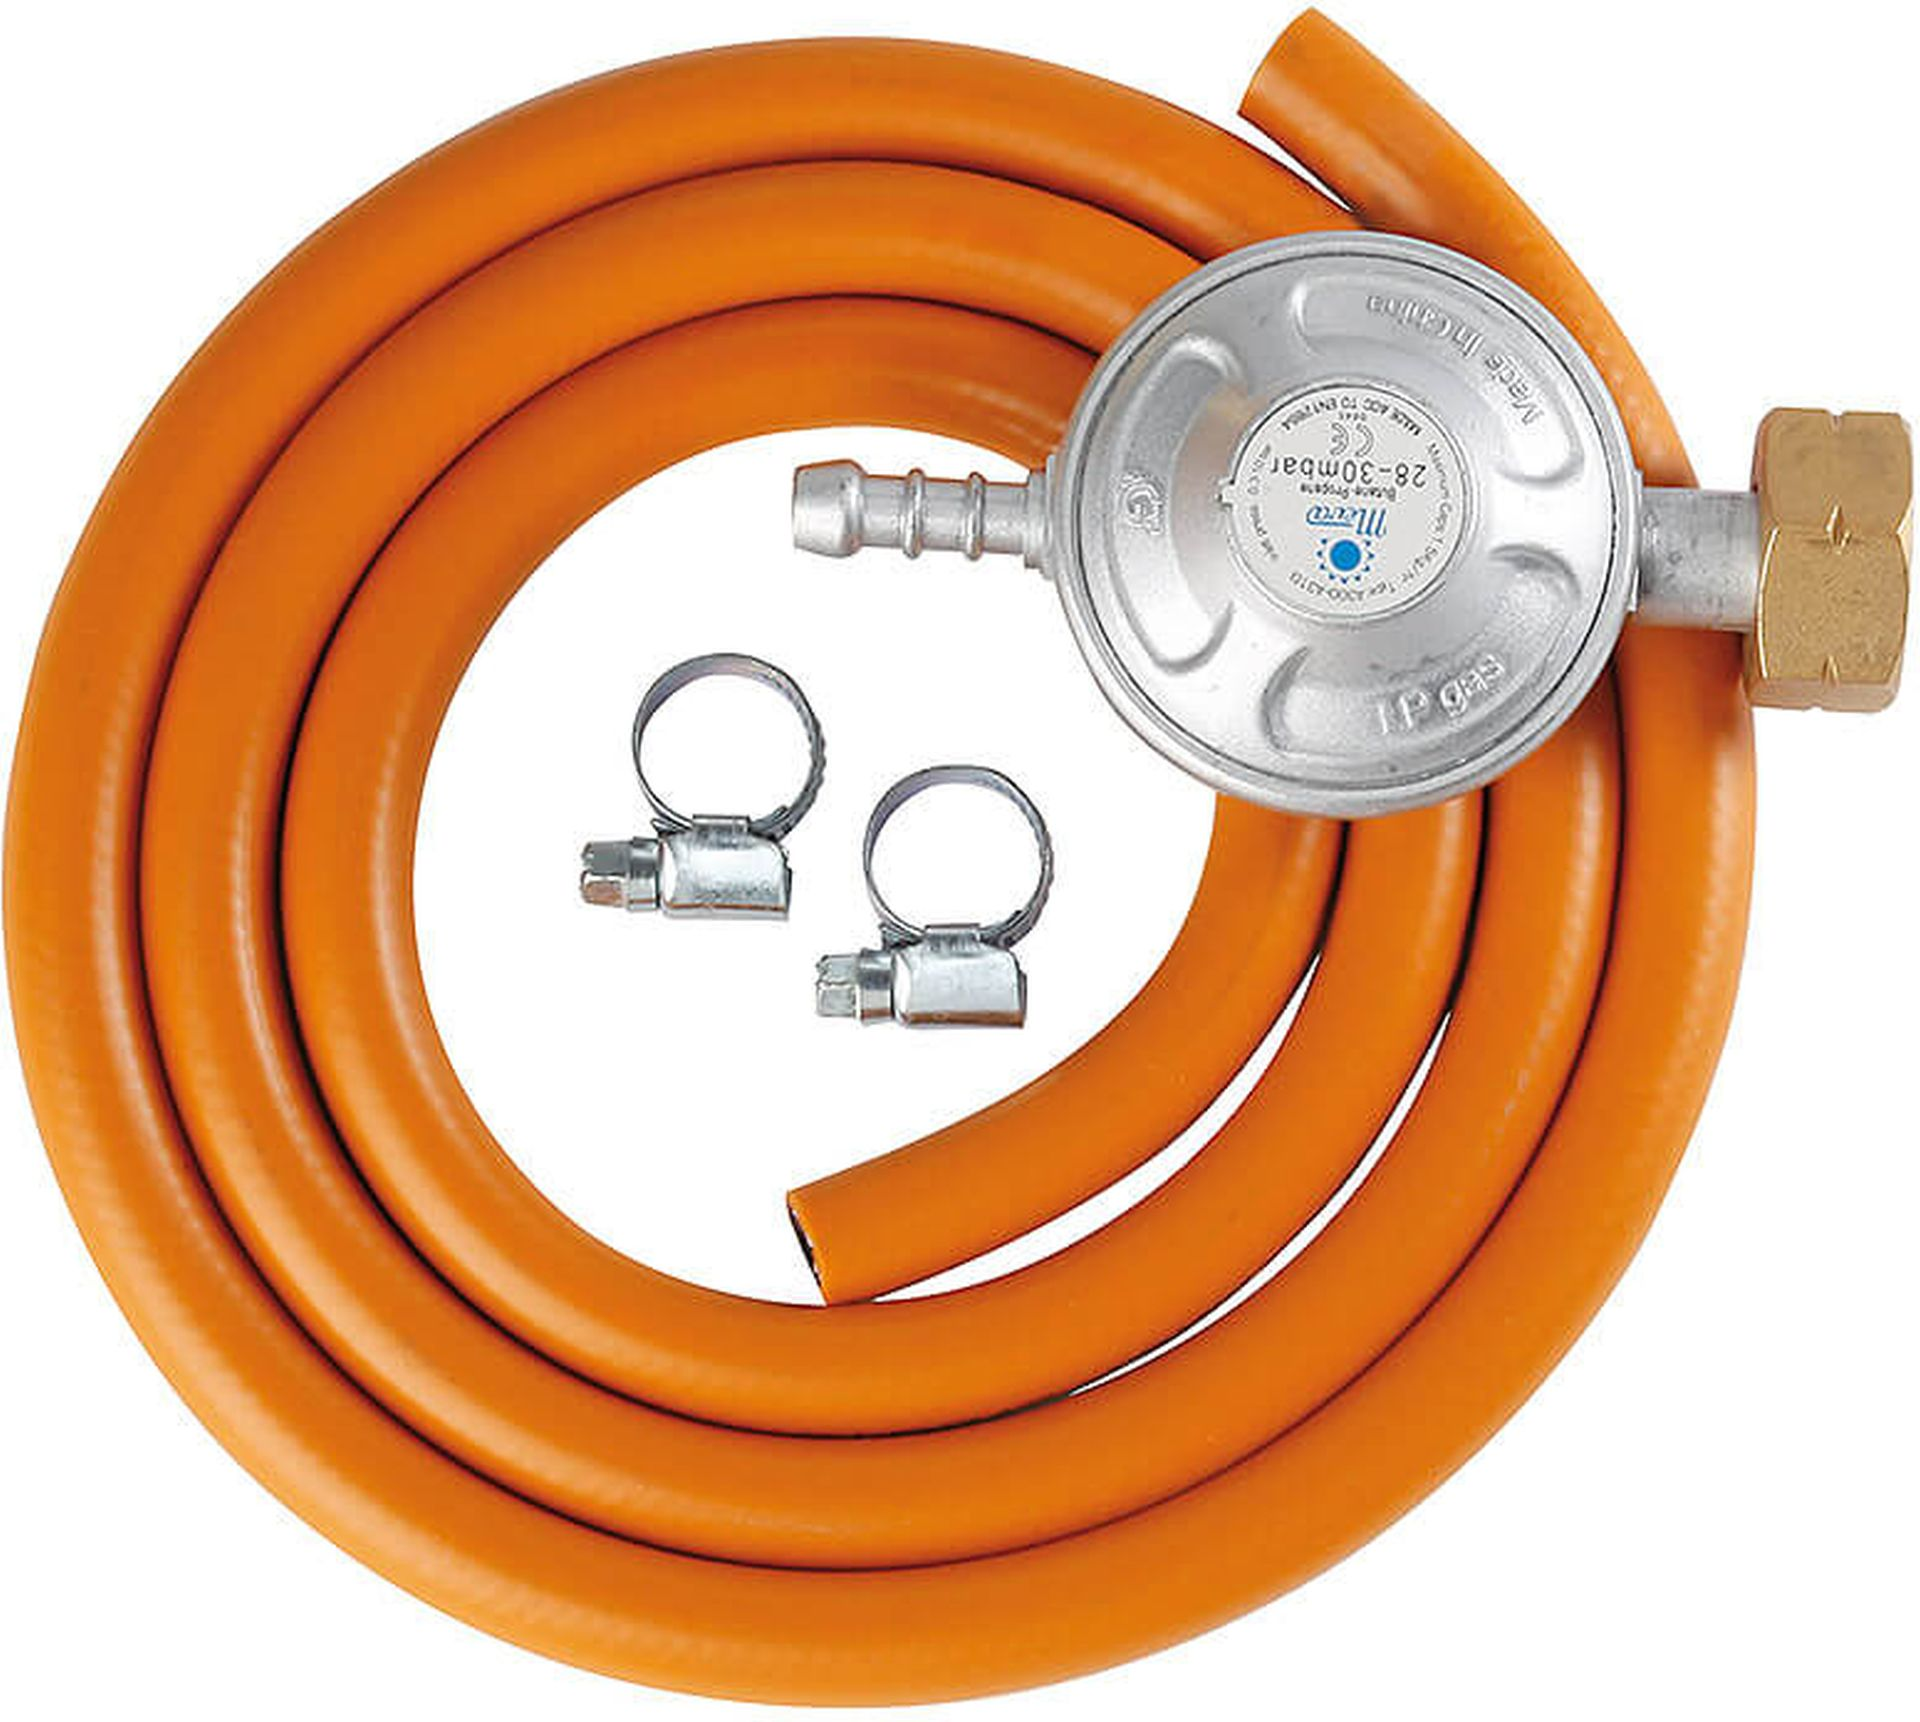 MEVA Hadice PB s regulátorem tlaku 30mBar - set originál, hadice 1,5m NP01007